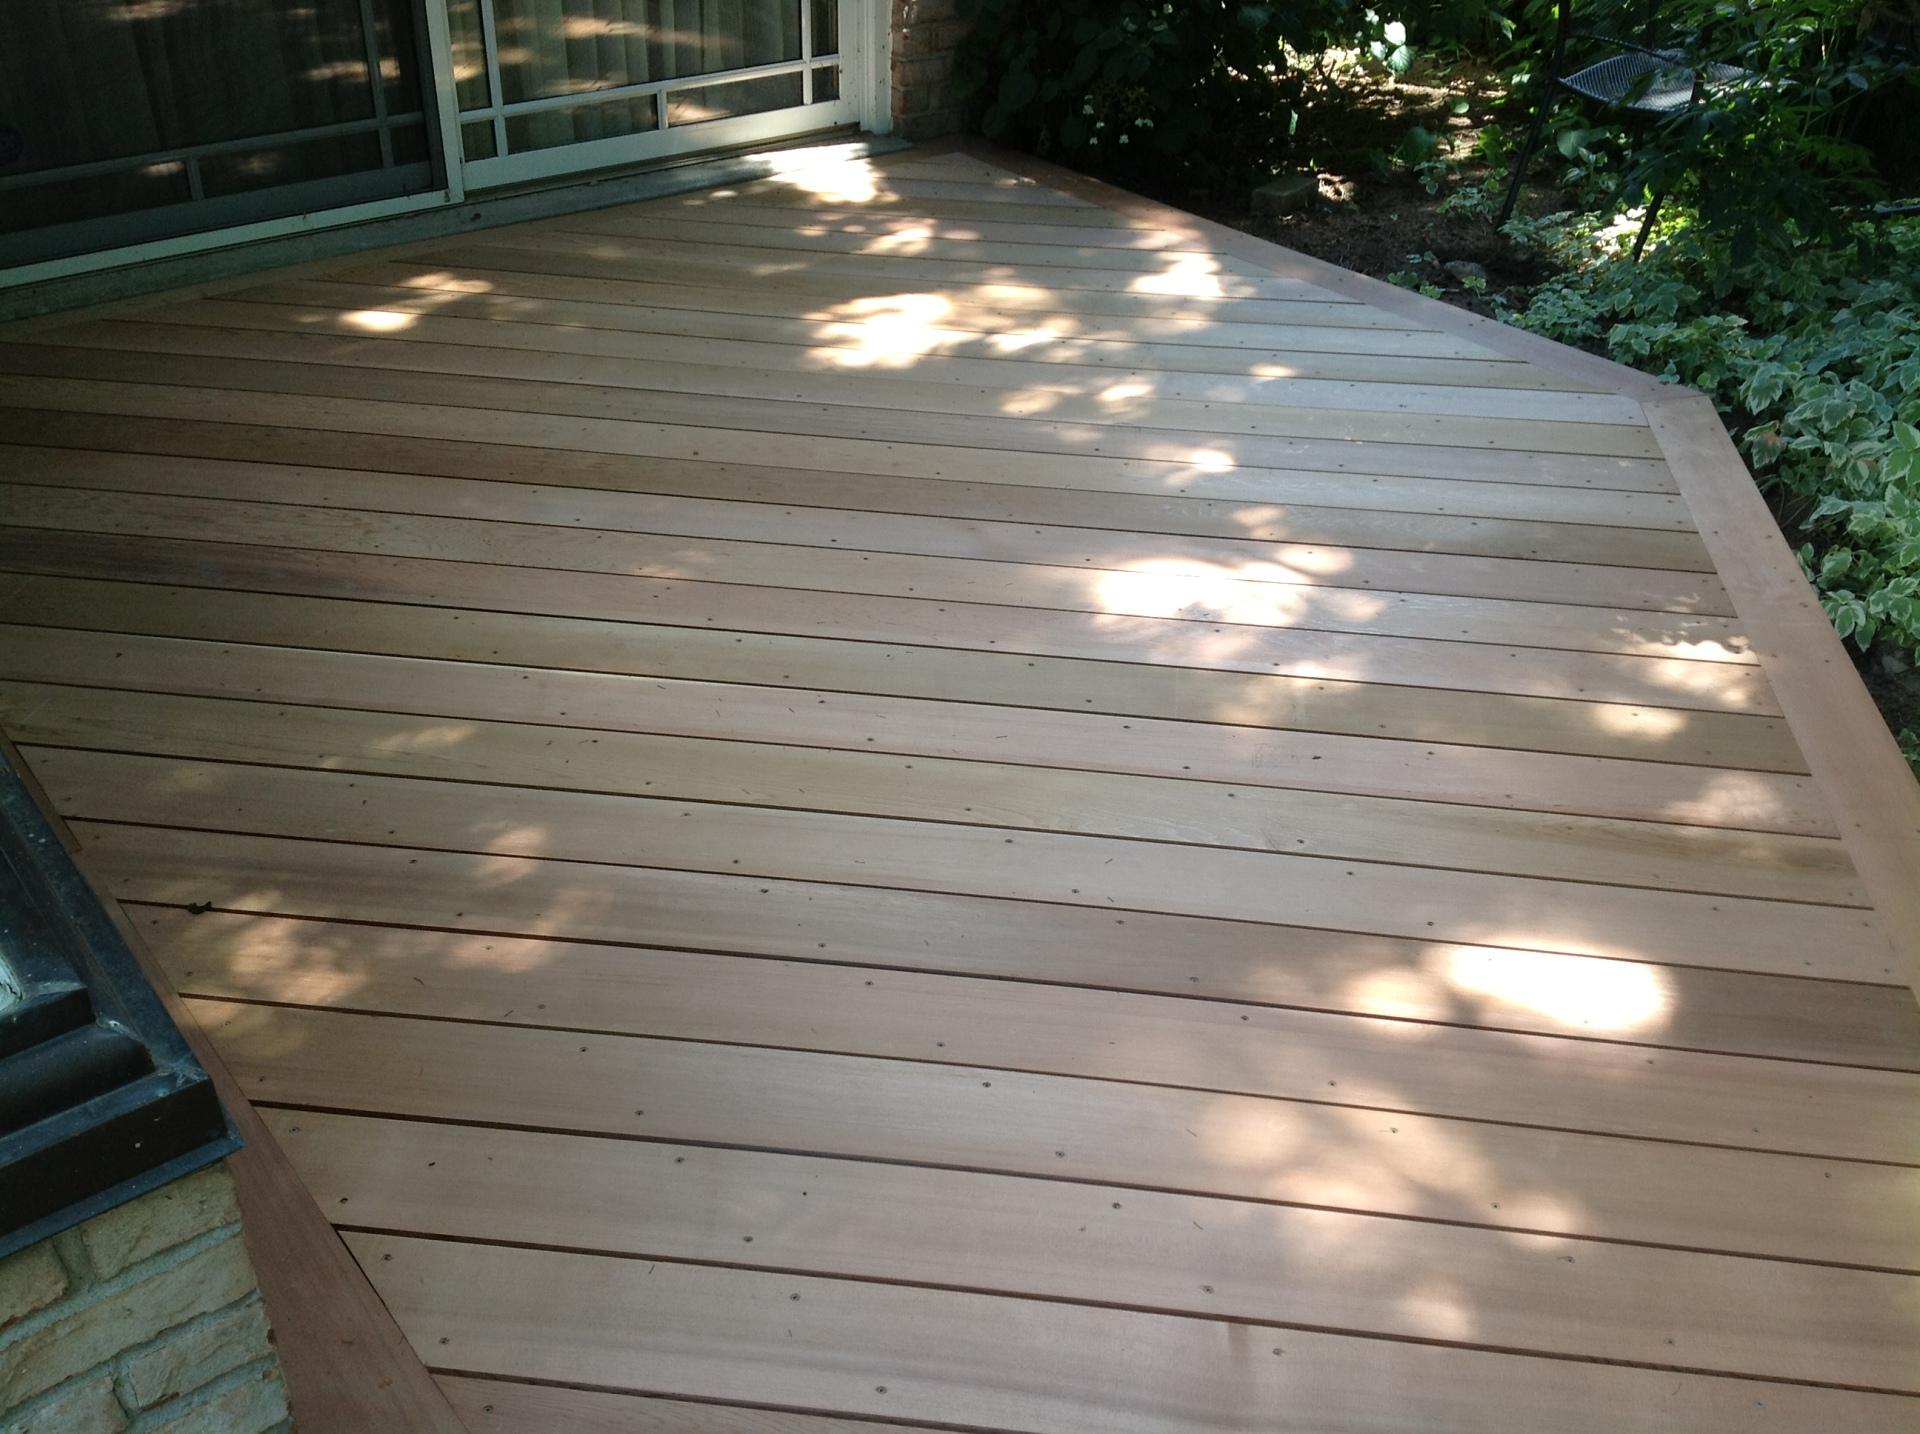 Cedar deck with diagonal design